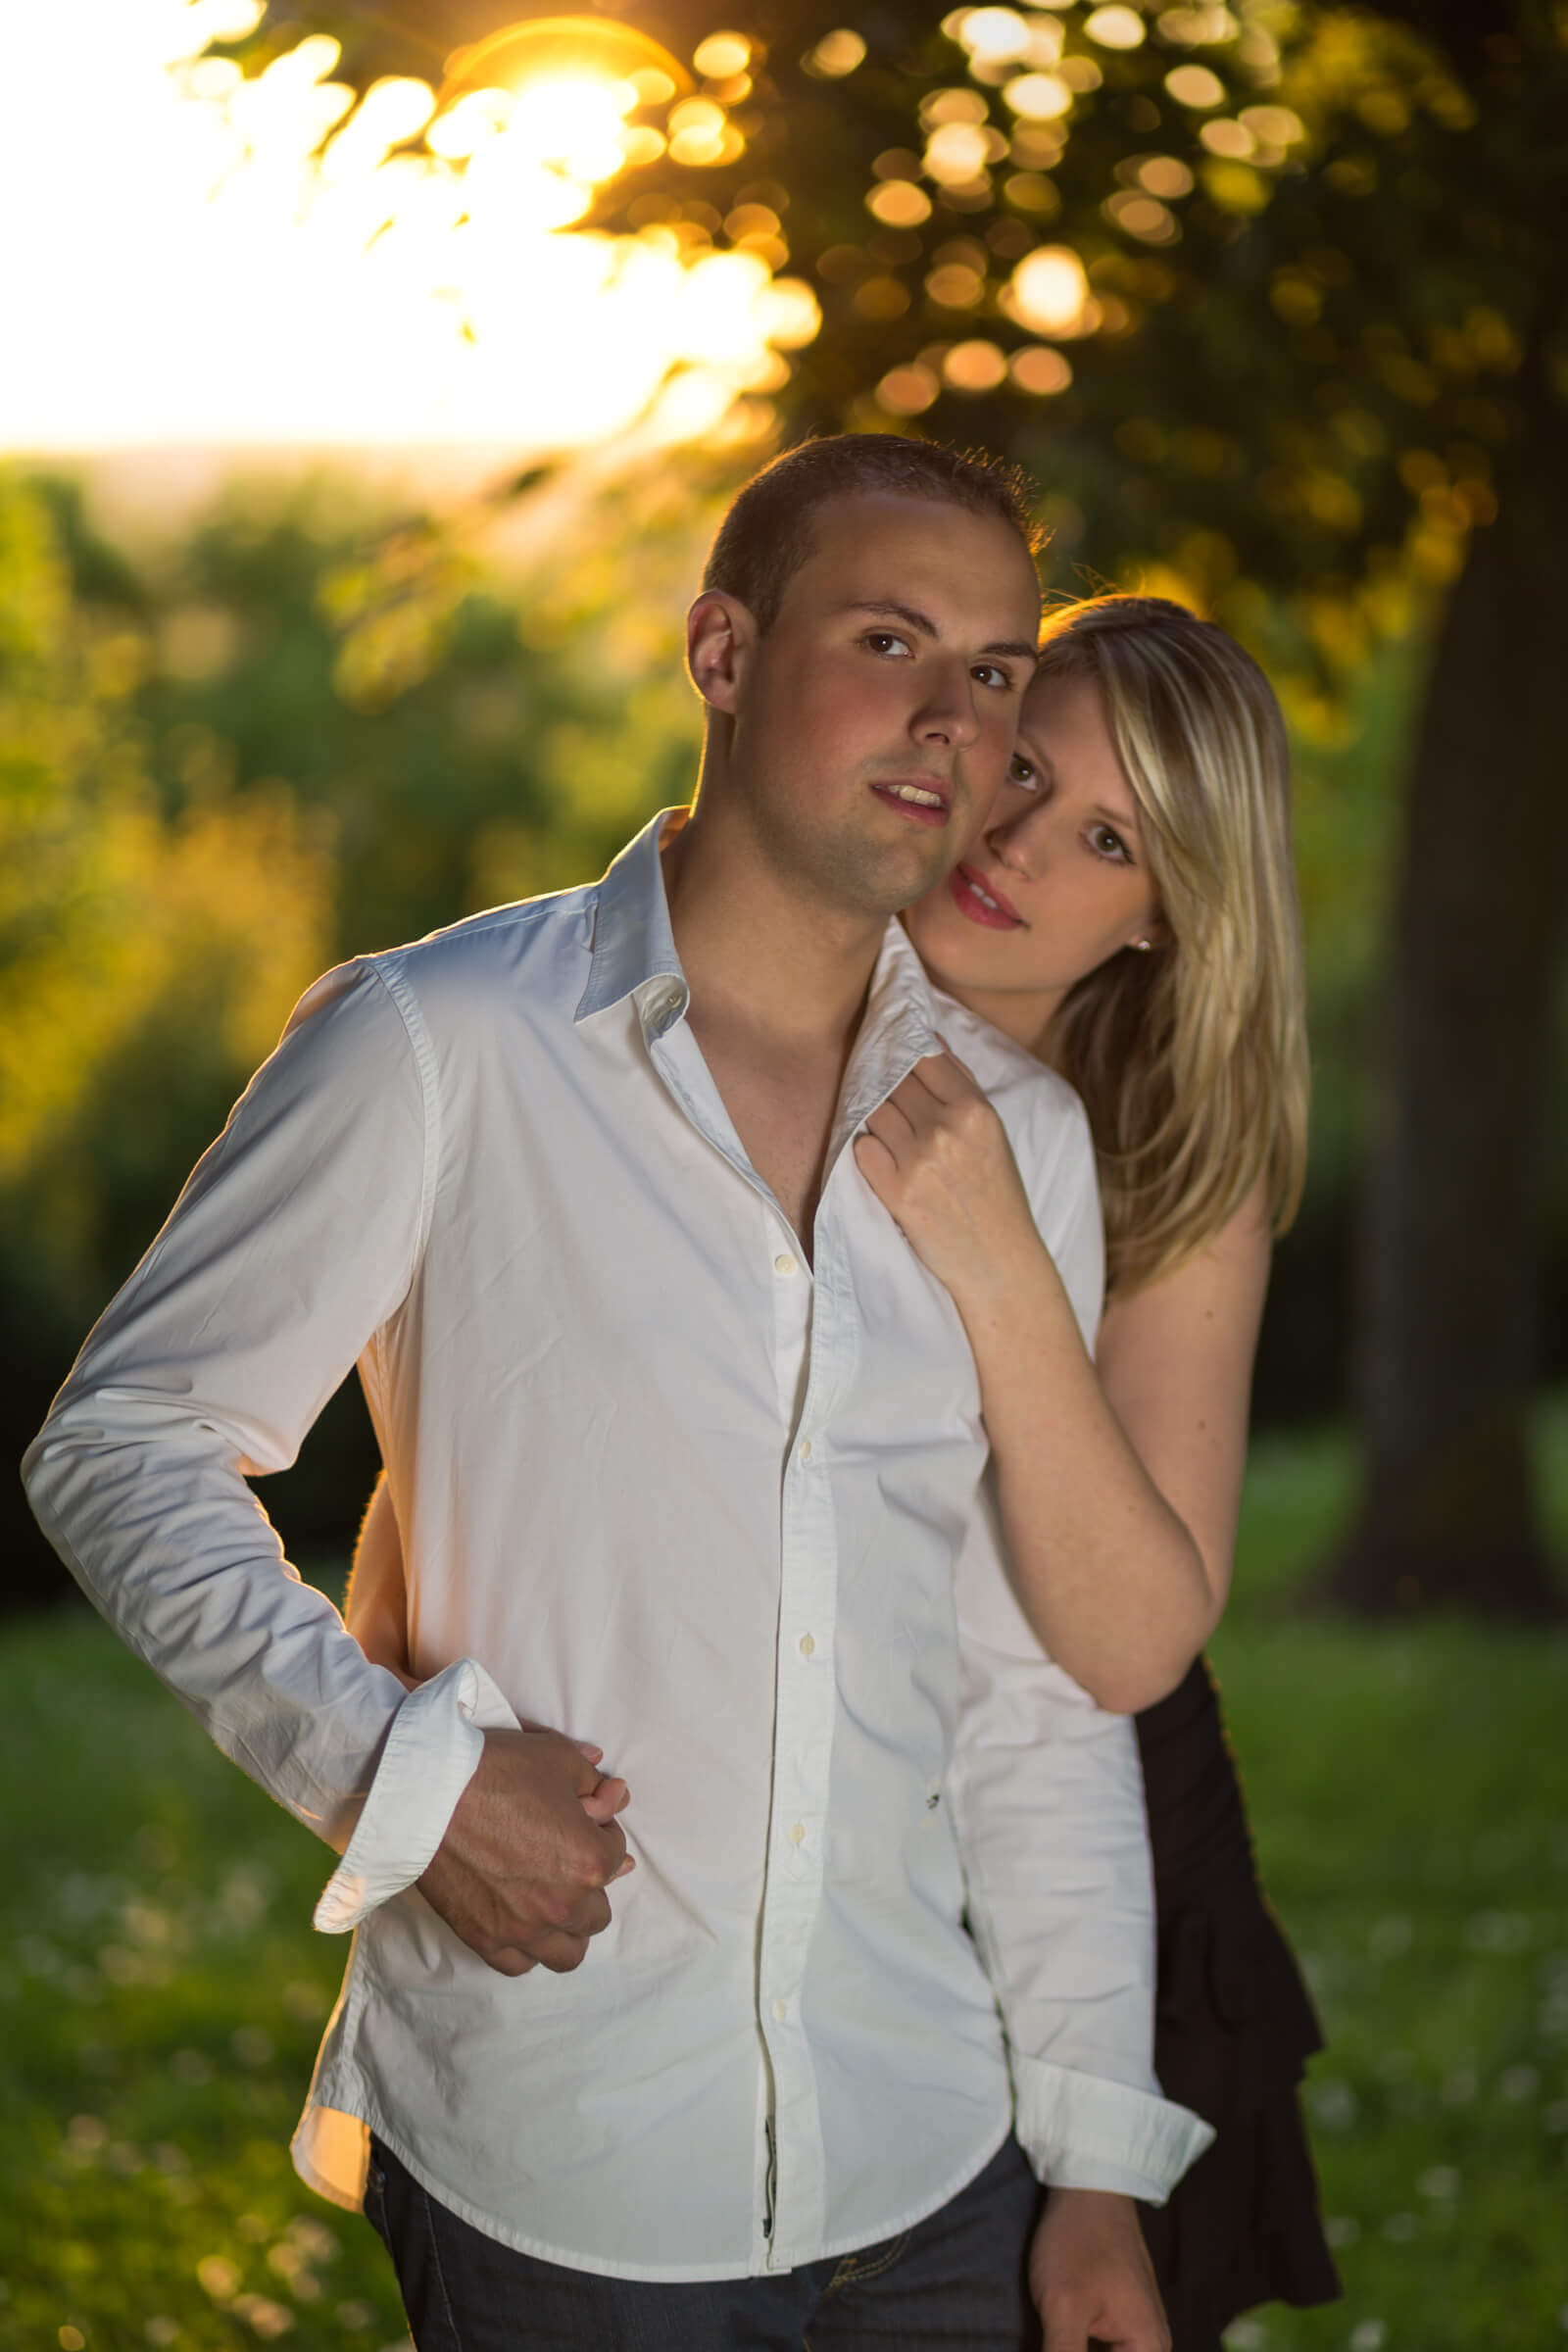 Photographe epernay Photo couple Tristan Meunier-4.jpg